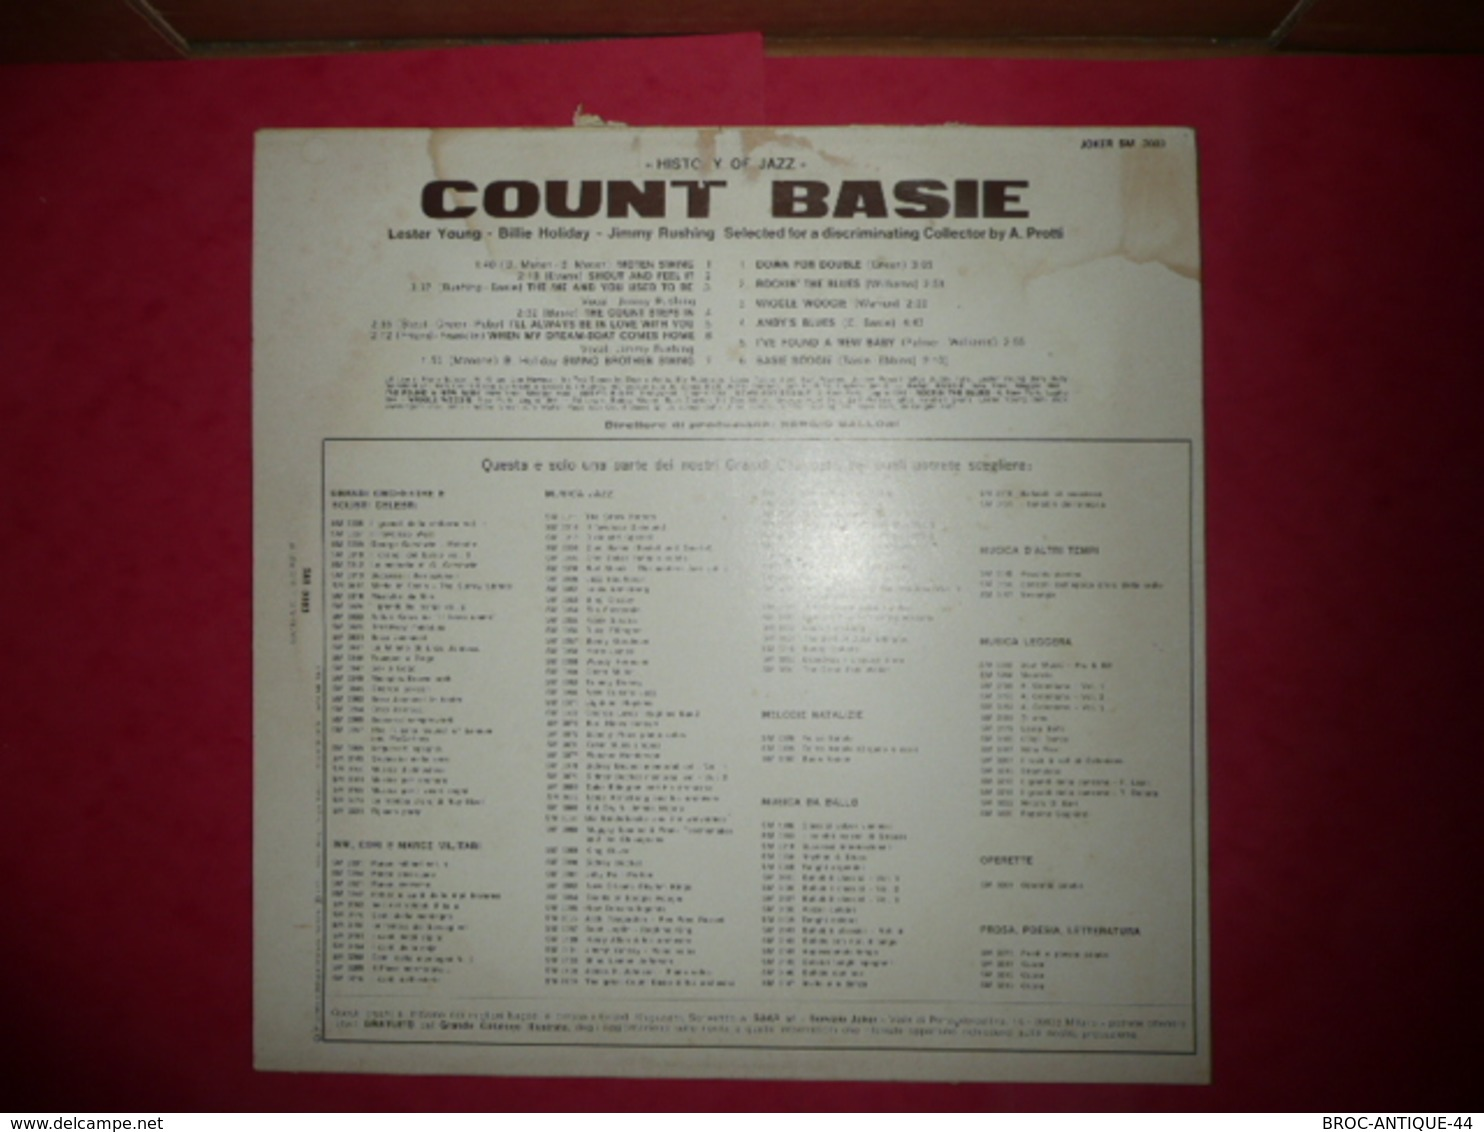 LP33 N°562 - COUNT BASIE AT SAVOY BALLROOM 1937-1944 - COMPILATION 13 TITRES - Jazz